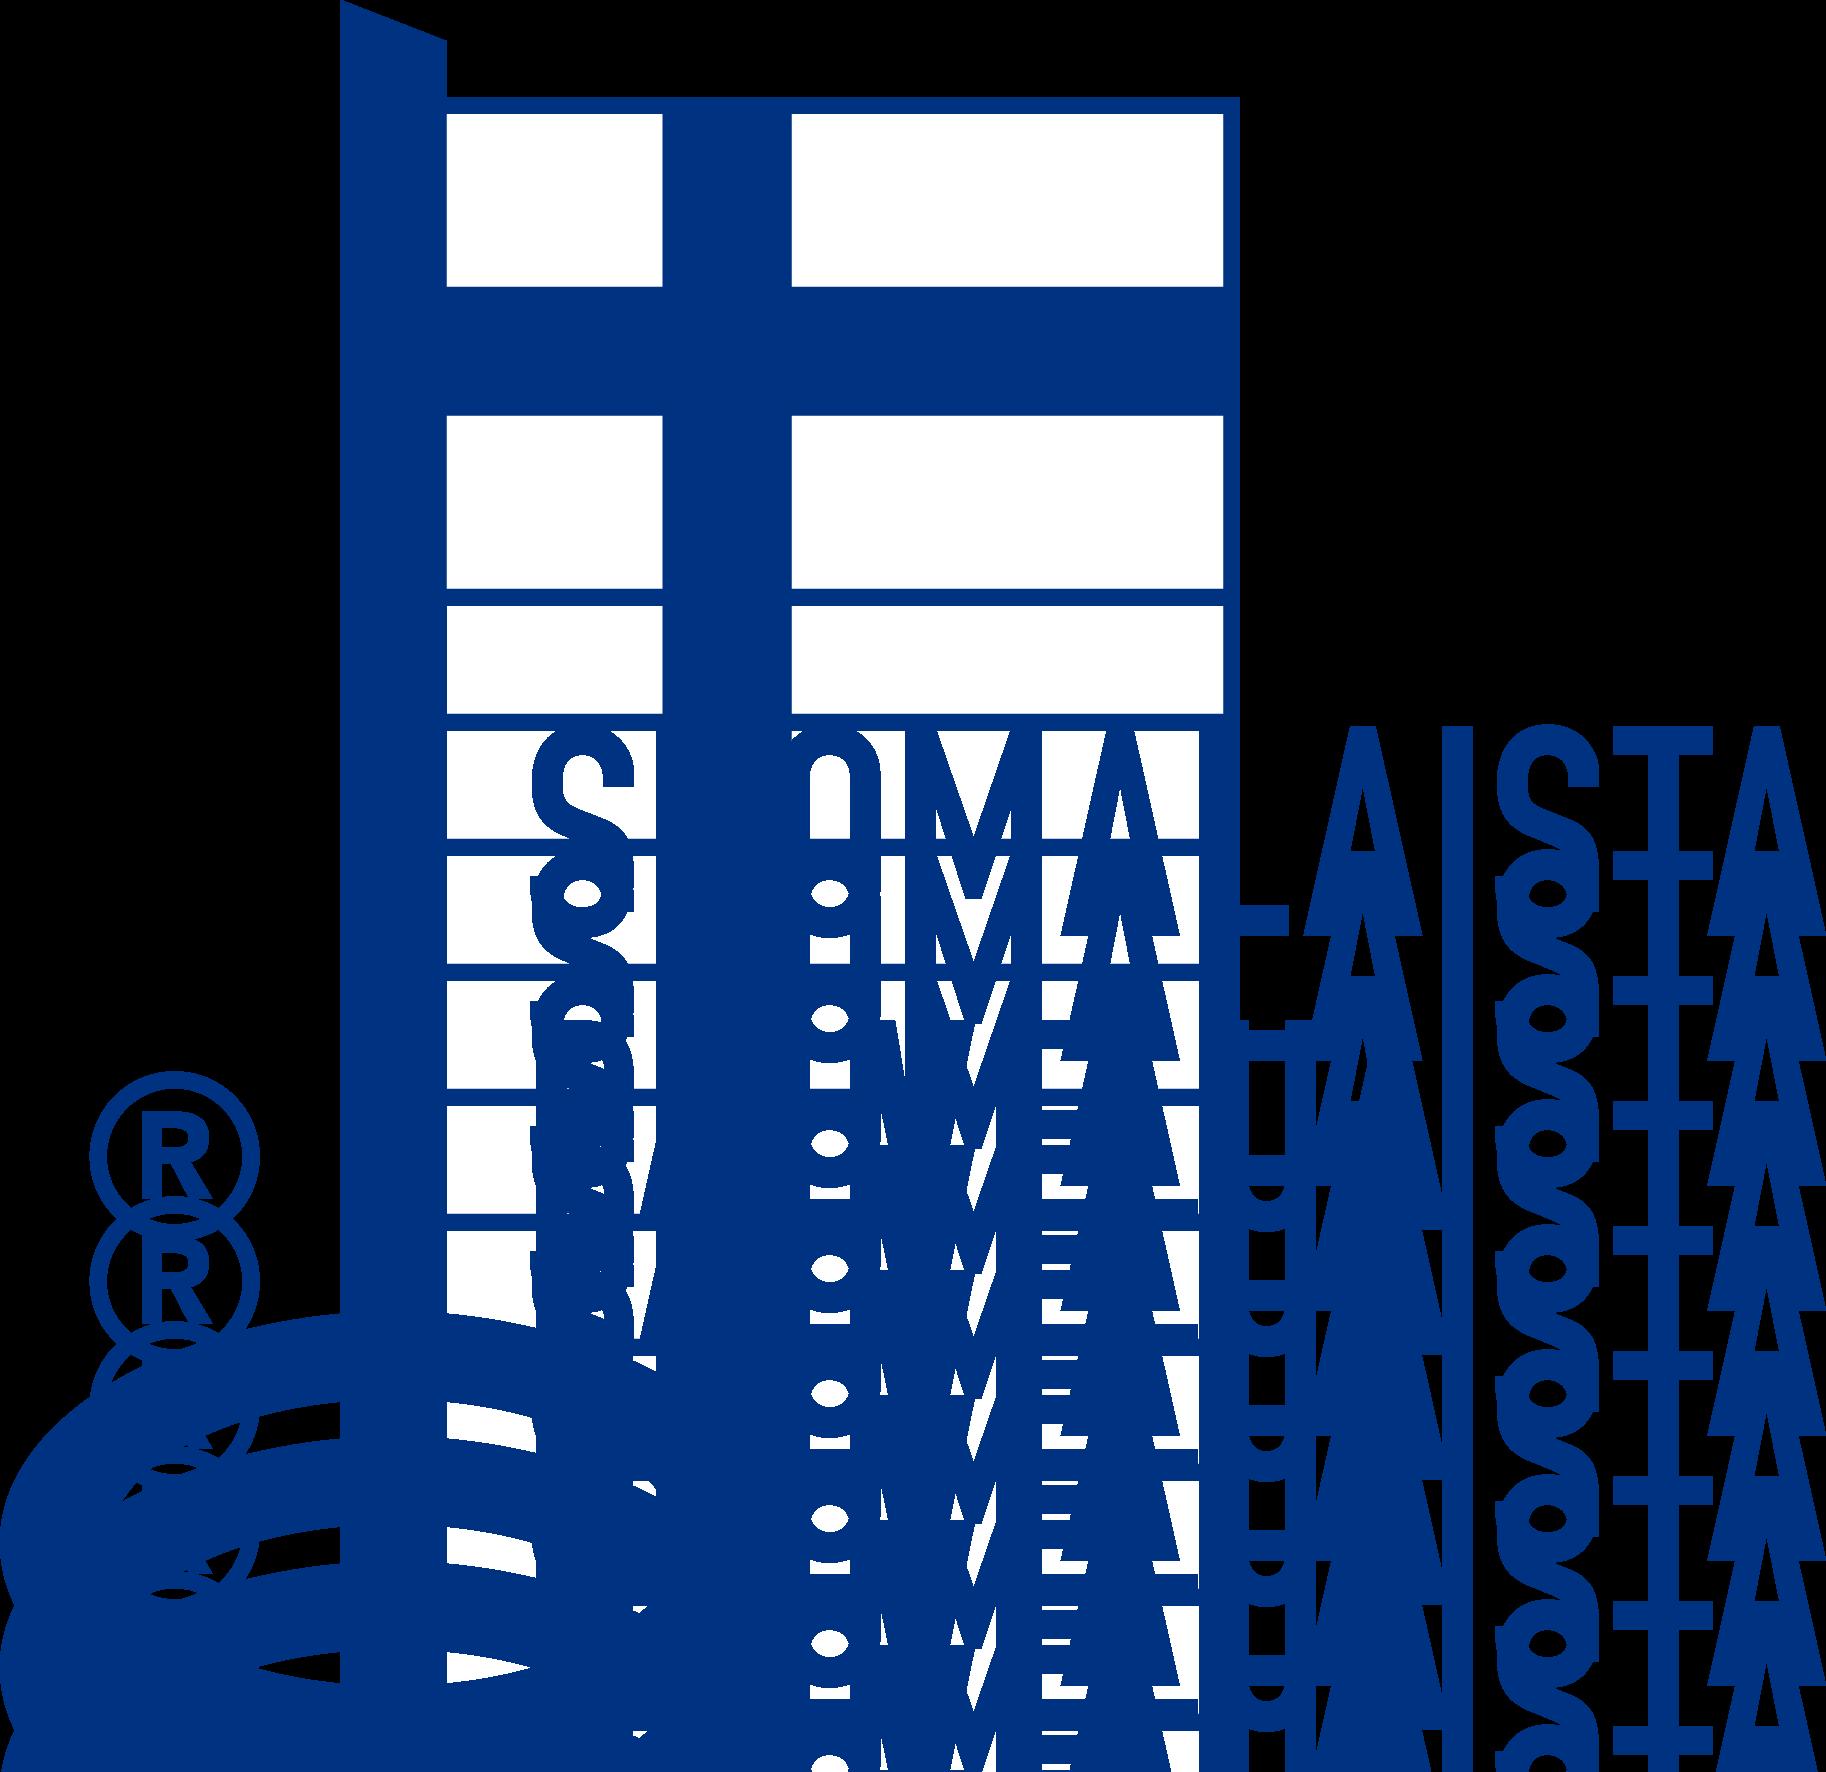 Suomalaista palvelus